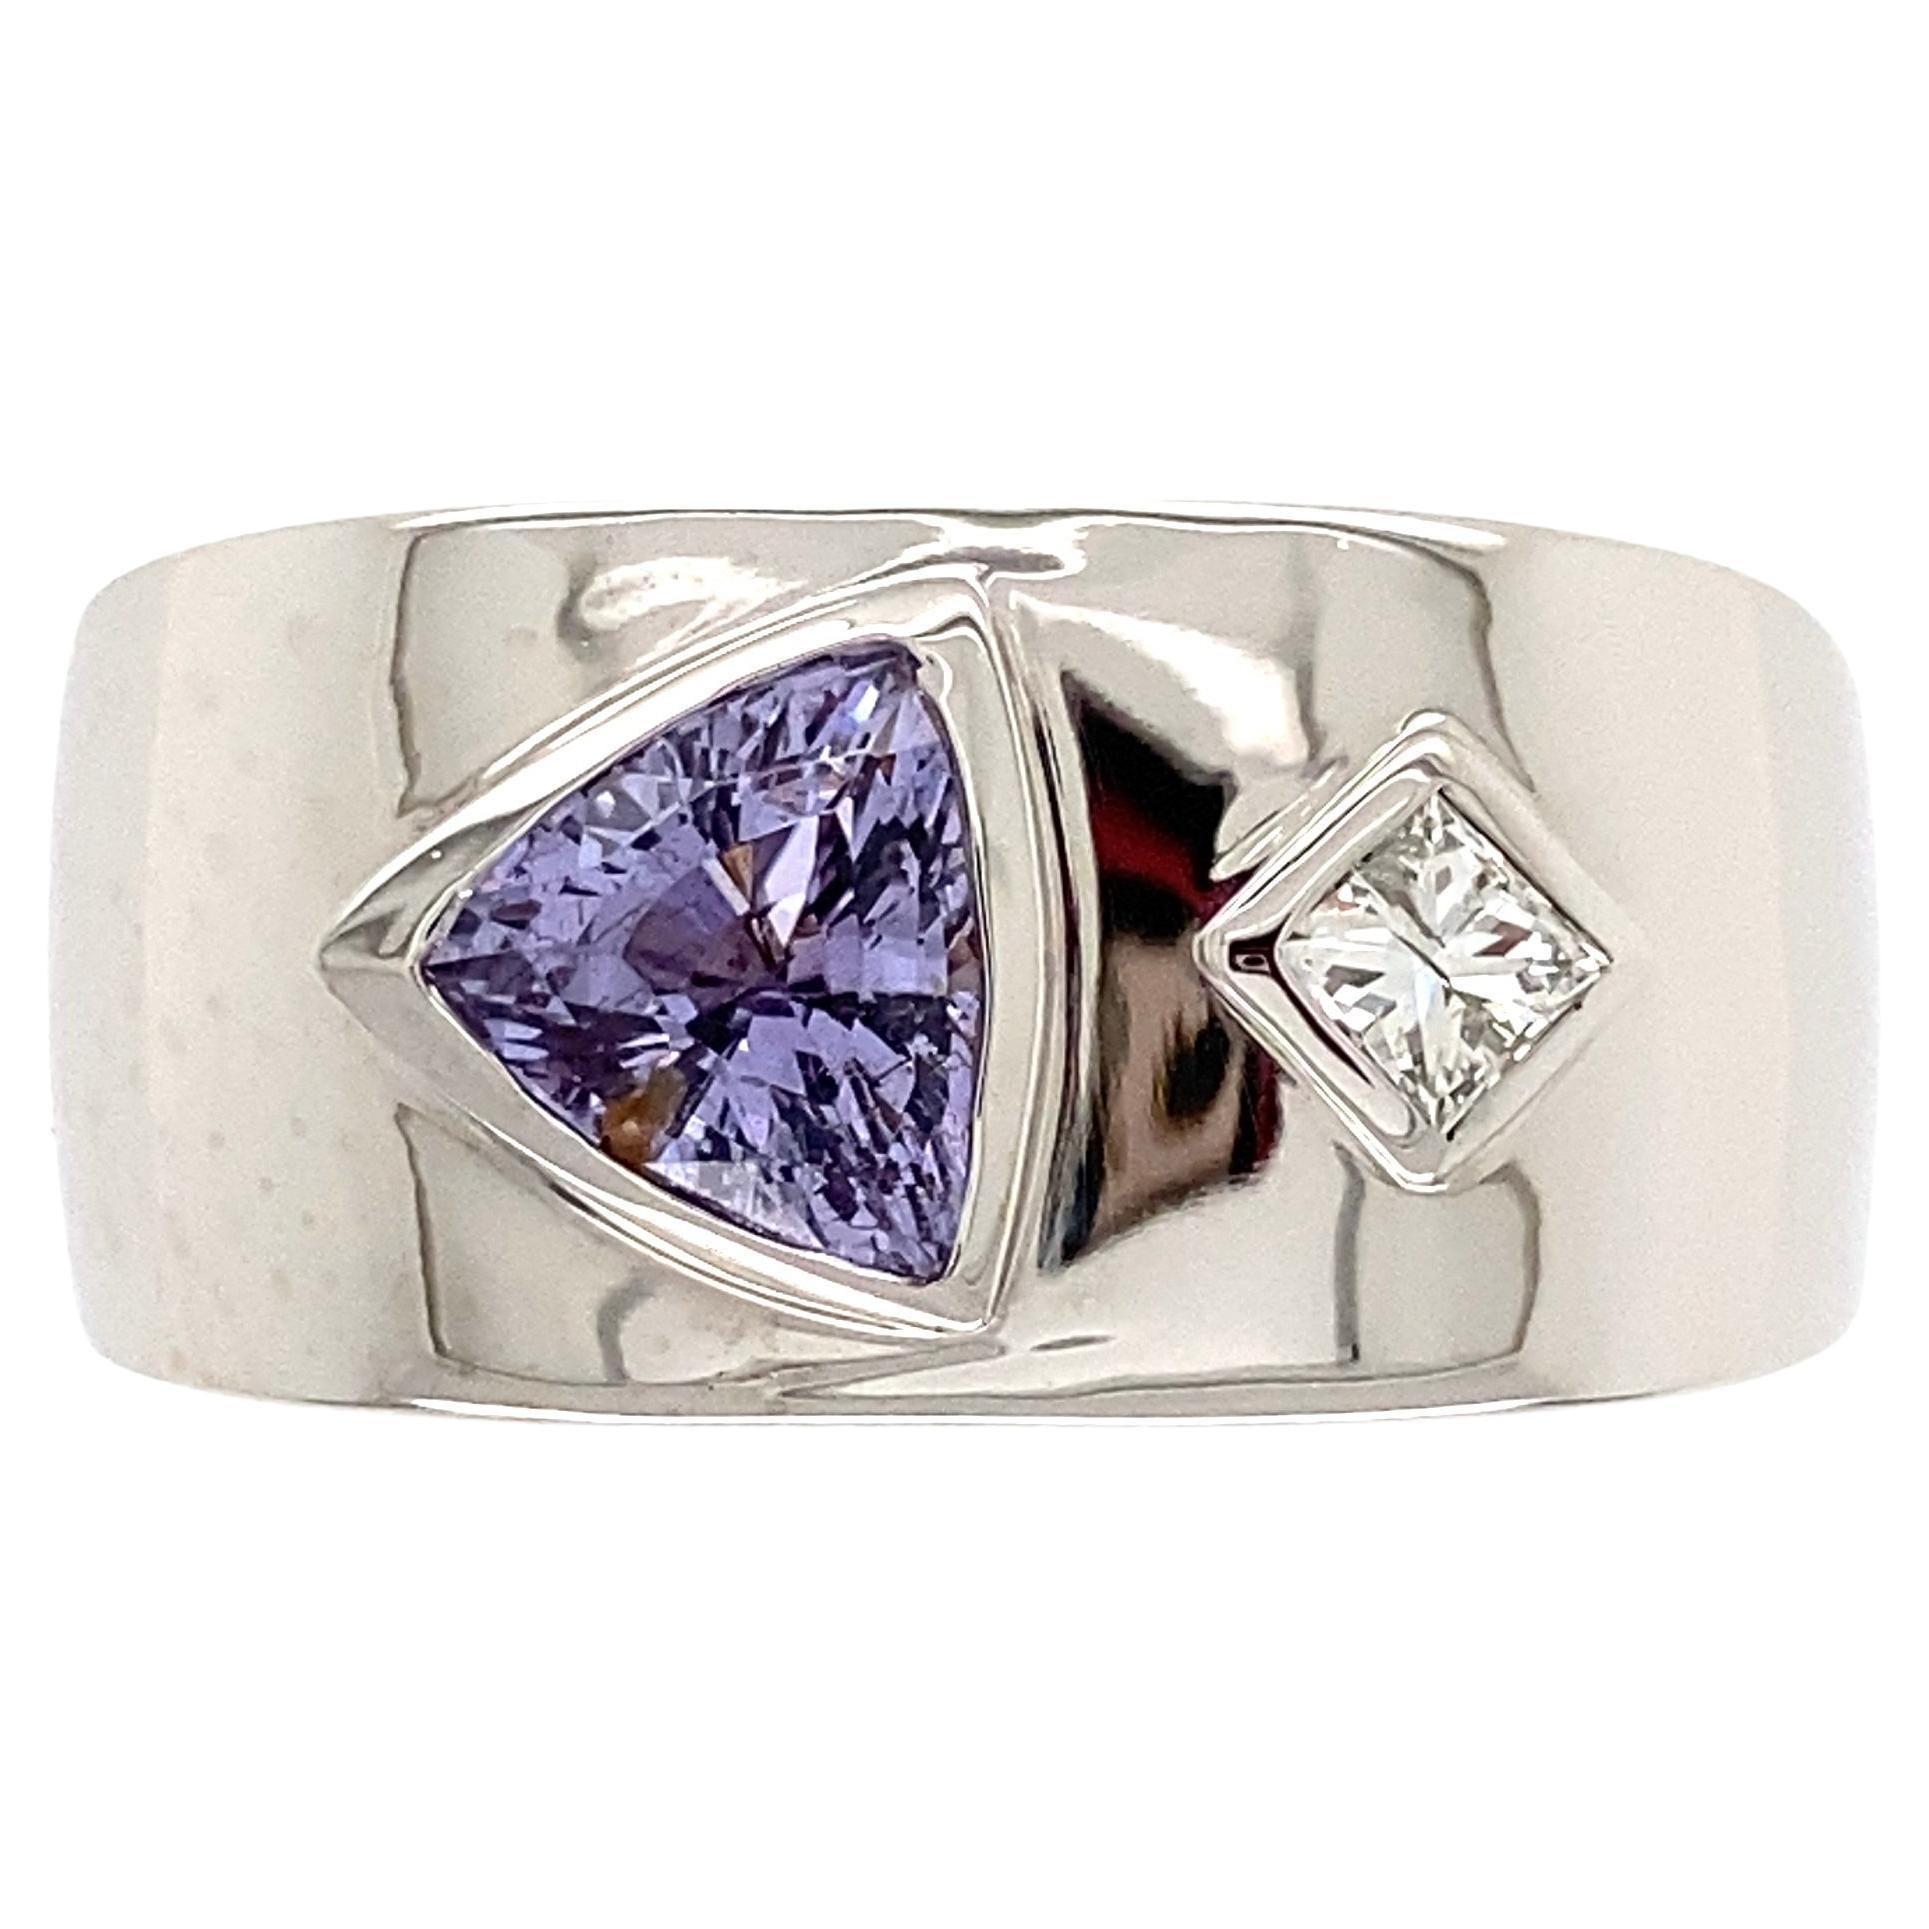 Fine Men's Trillion Spinel and Diamond Gold Signet Ring Fine Estate Jewelry